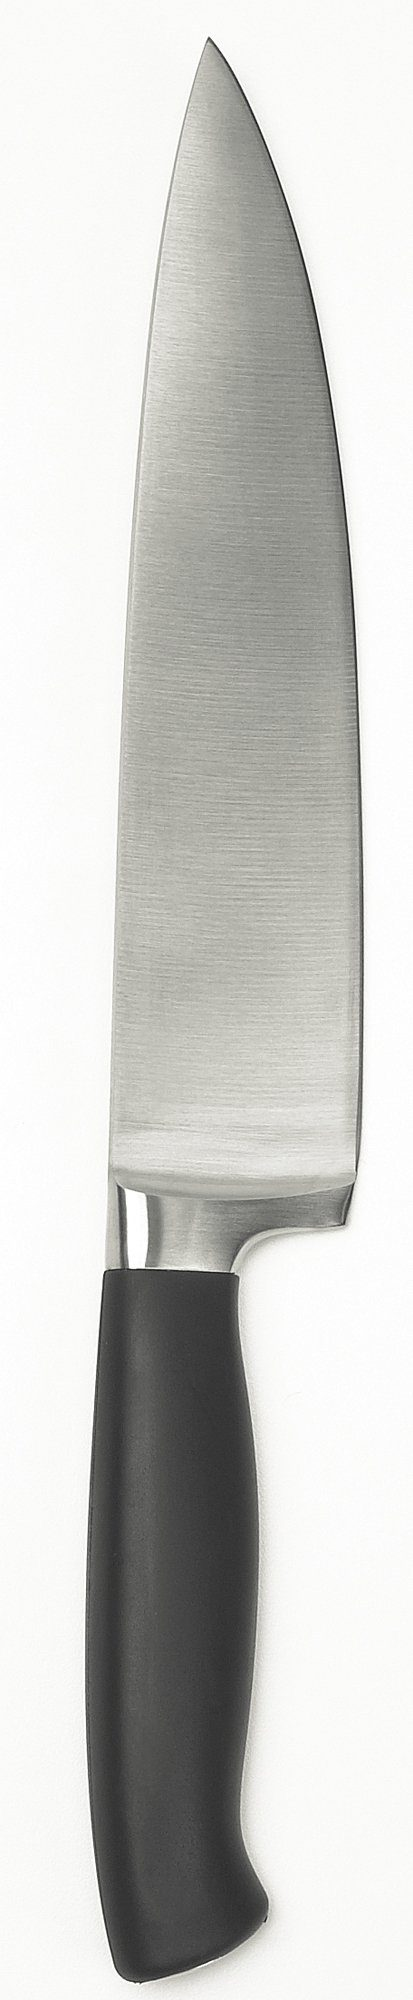 OXO Chefmesser, 20 cm